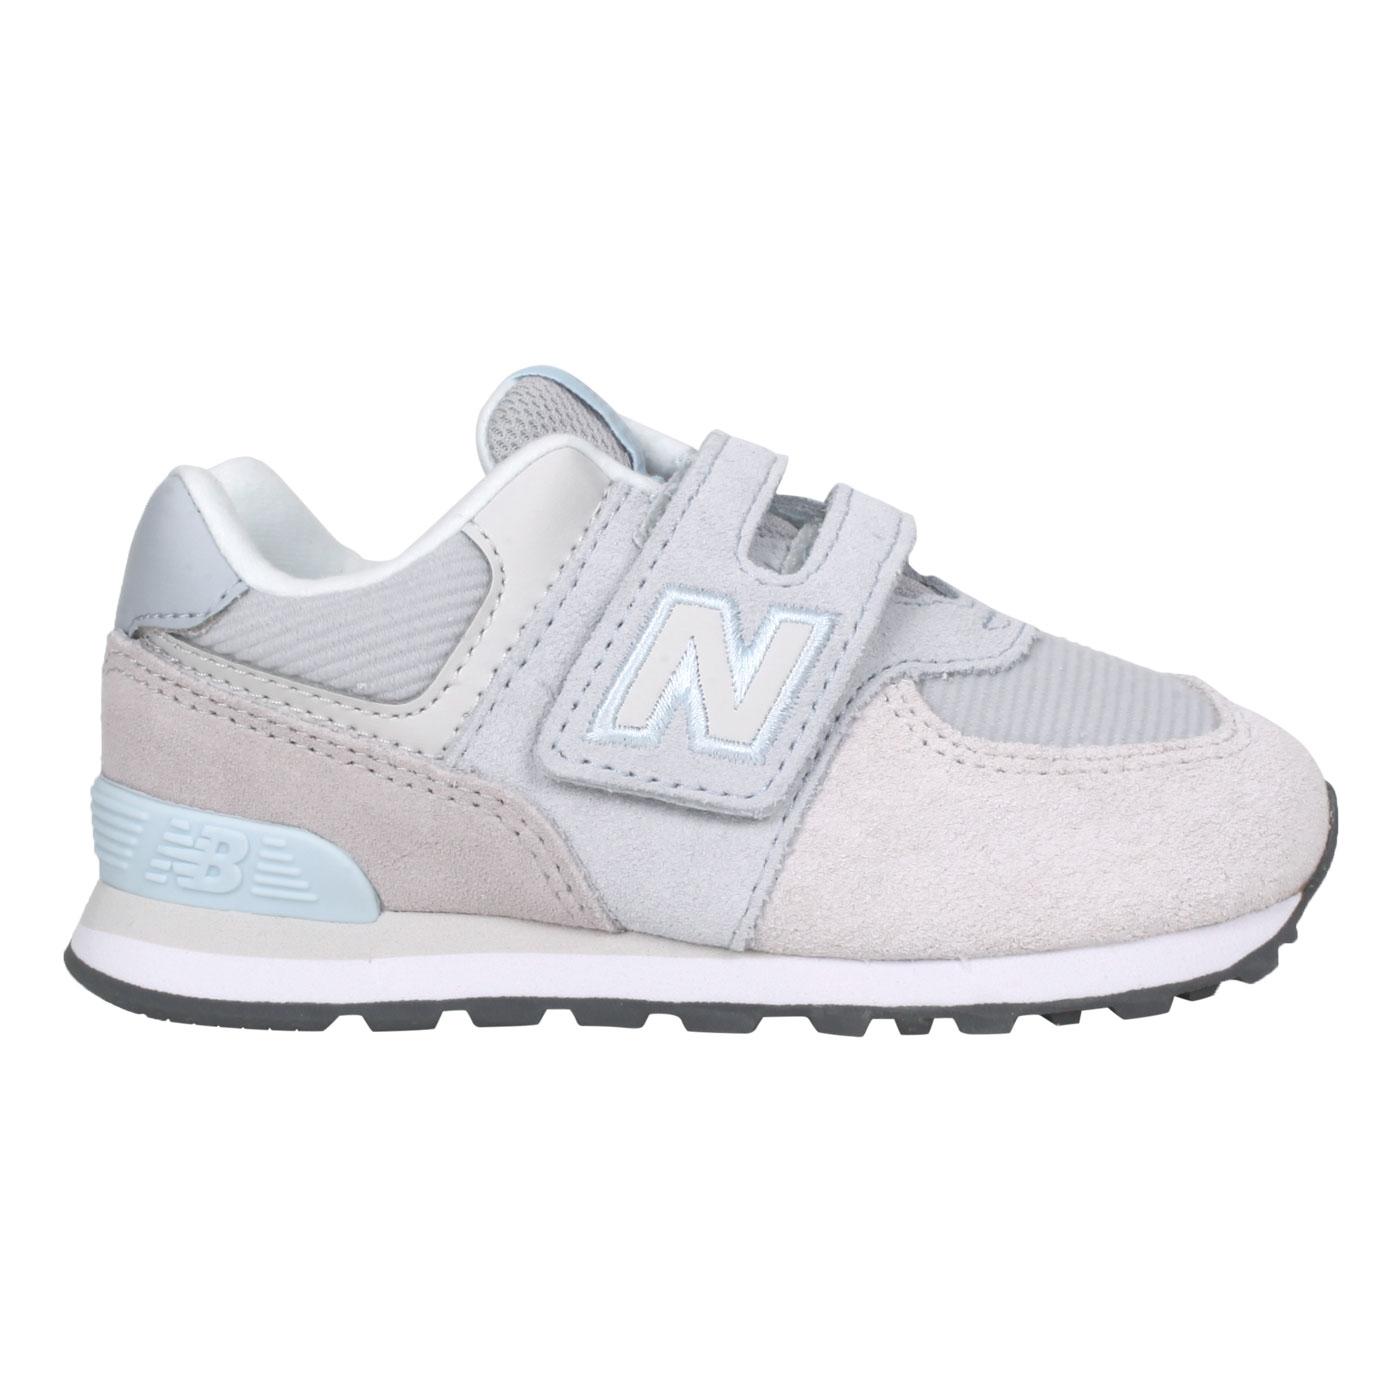 NEW BALANCE 小童休閒運動鞋-WIDE IV574WN1